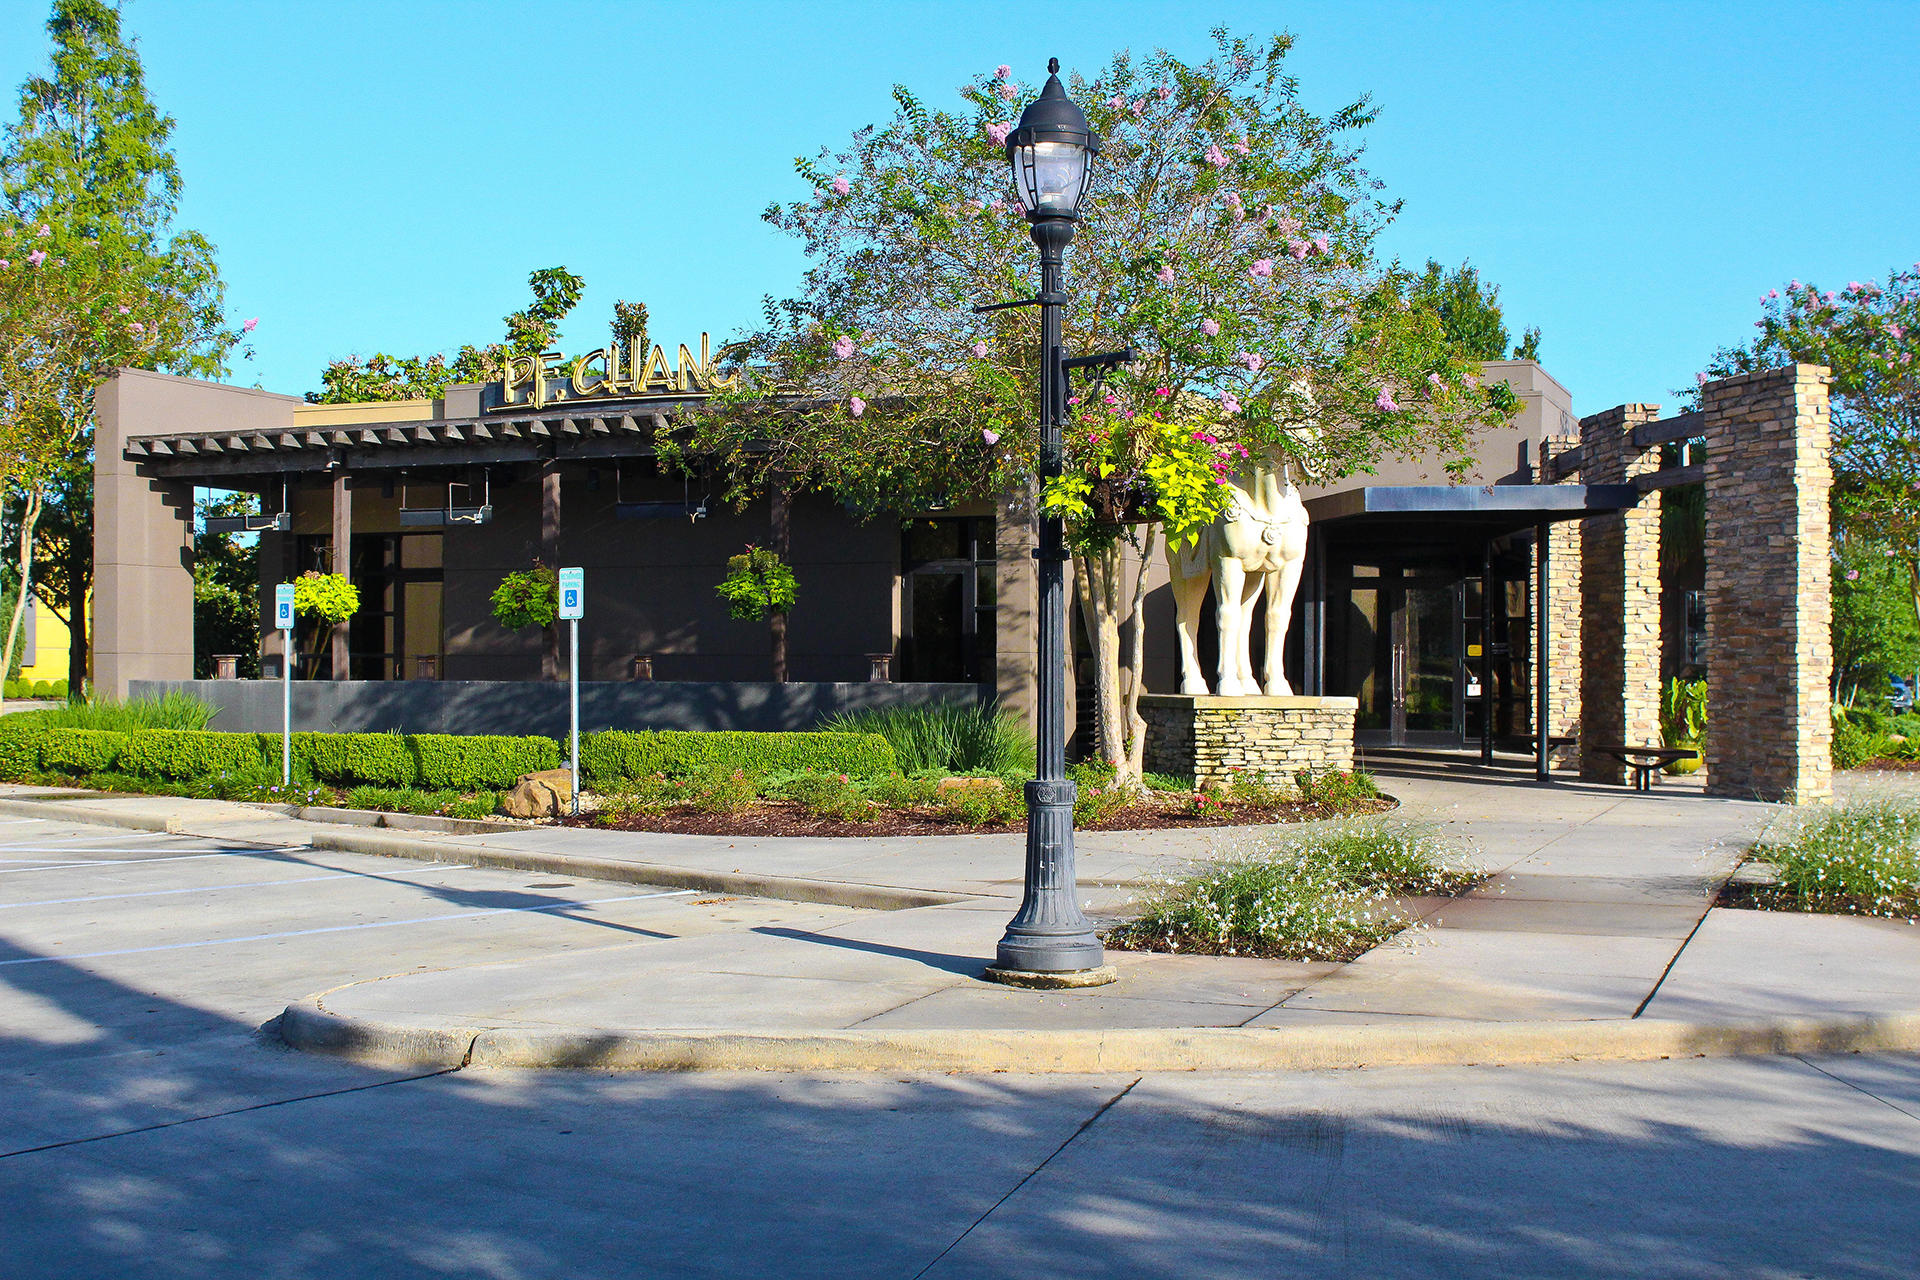 Superb P F Changs In 7341 Corporate Blvd Baton Rouge La Asian Download Free Architecture Designs Embacsunscenecom